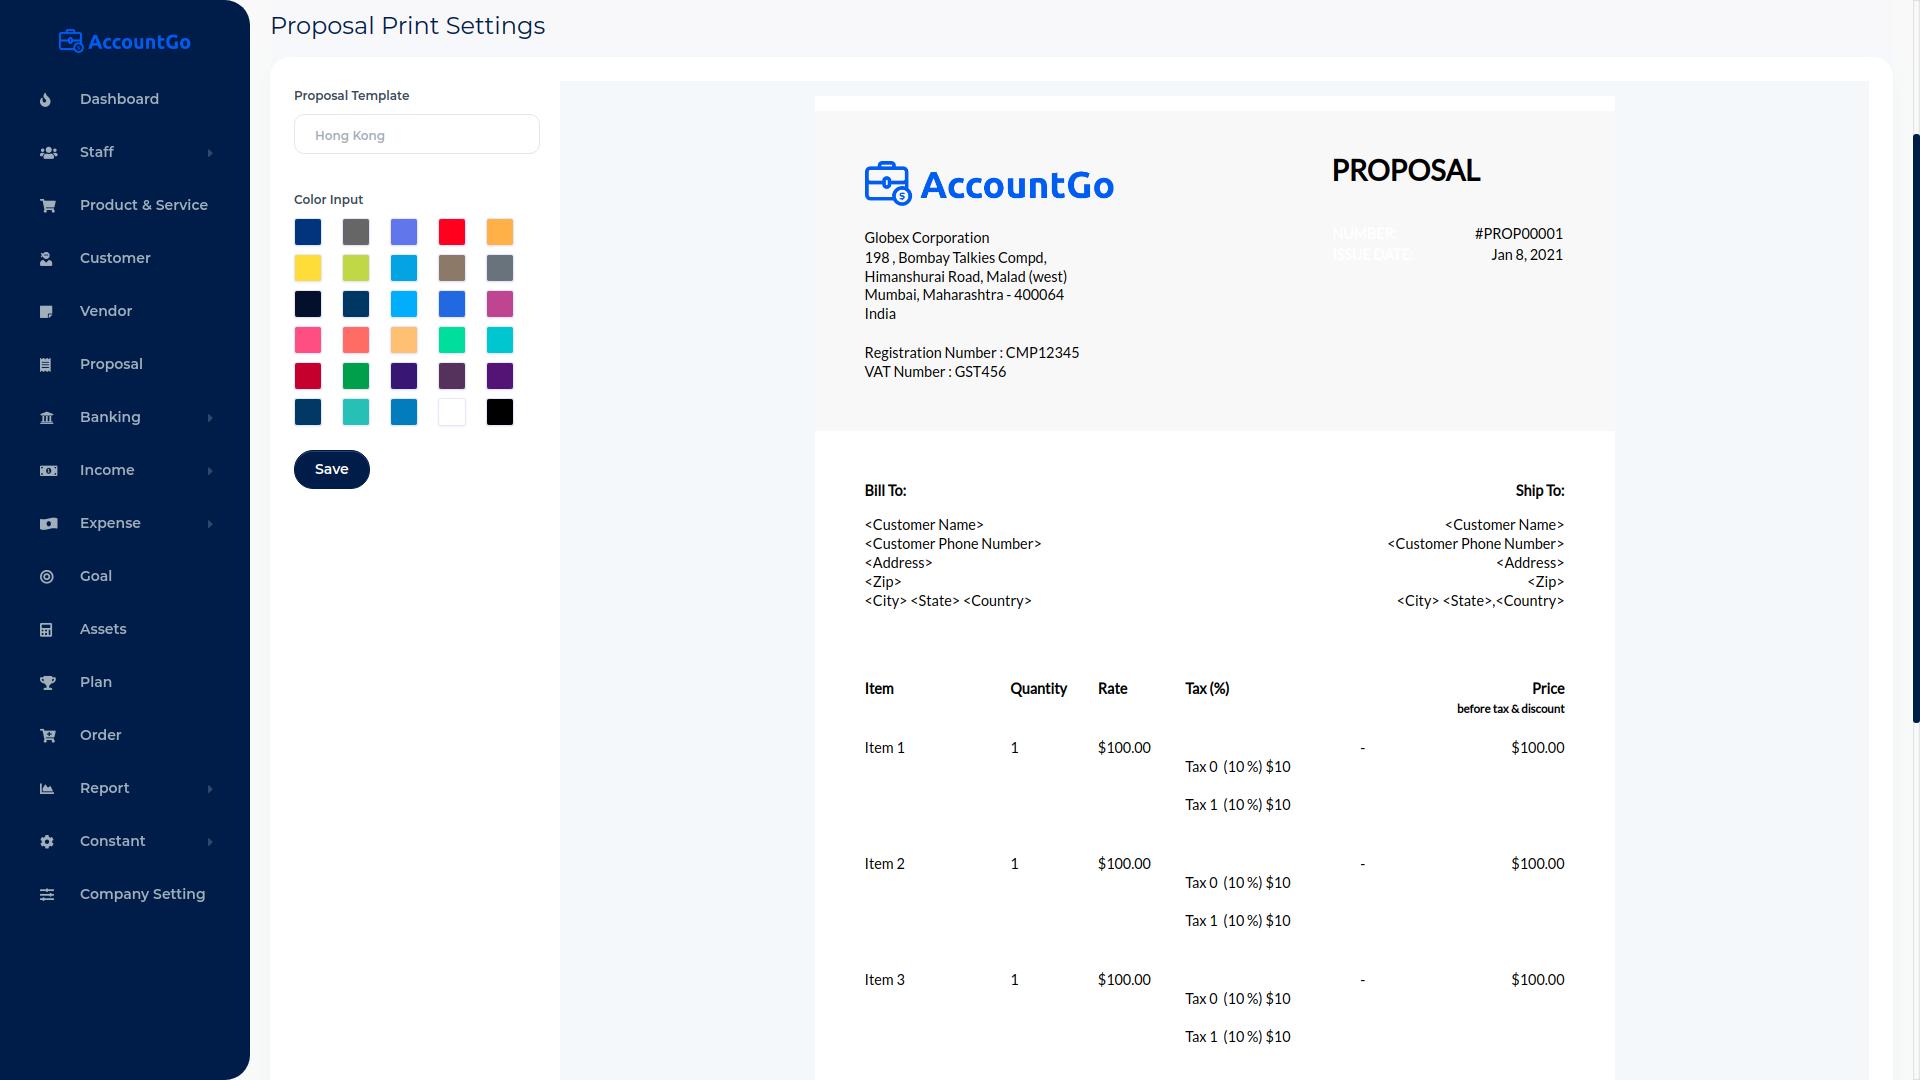 AccountGo SaaS - Accounting and Billing Tool - 16